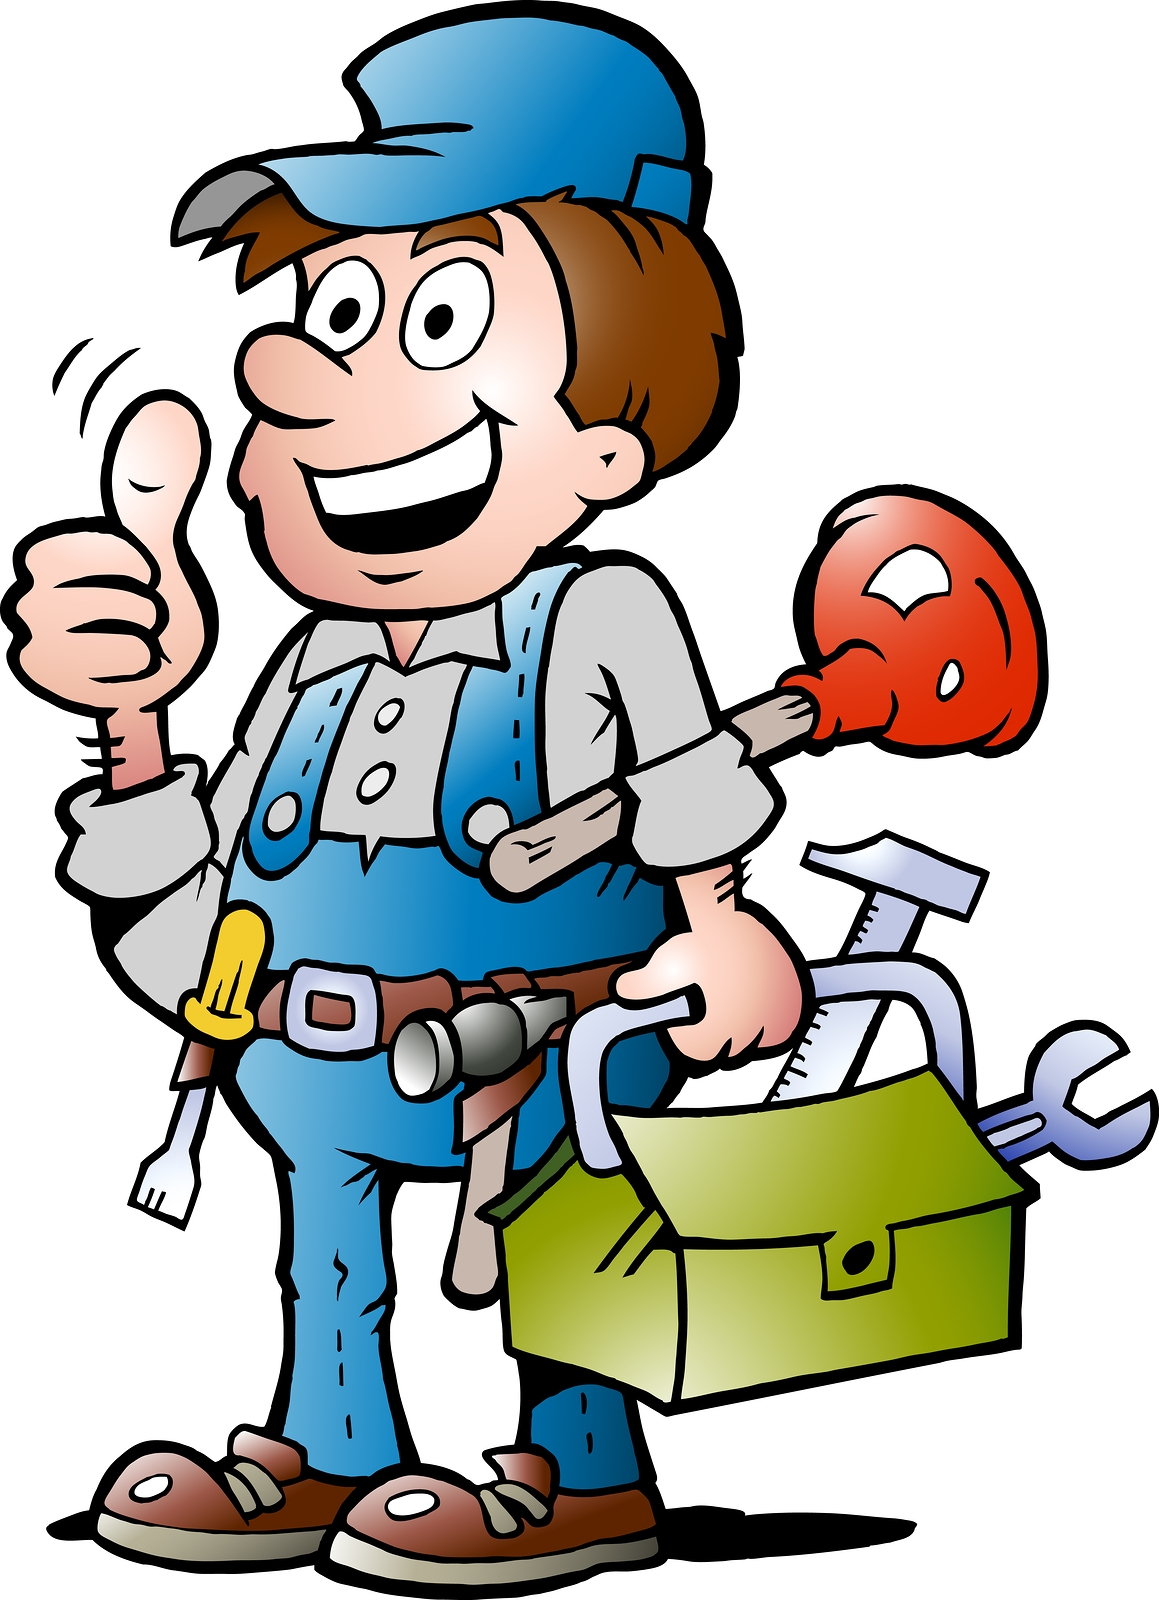 Men clipart plumbing, Men plumbing Transparent FREE for.